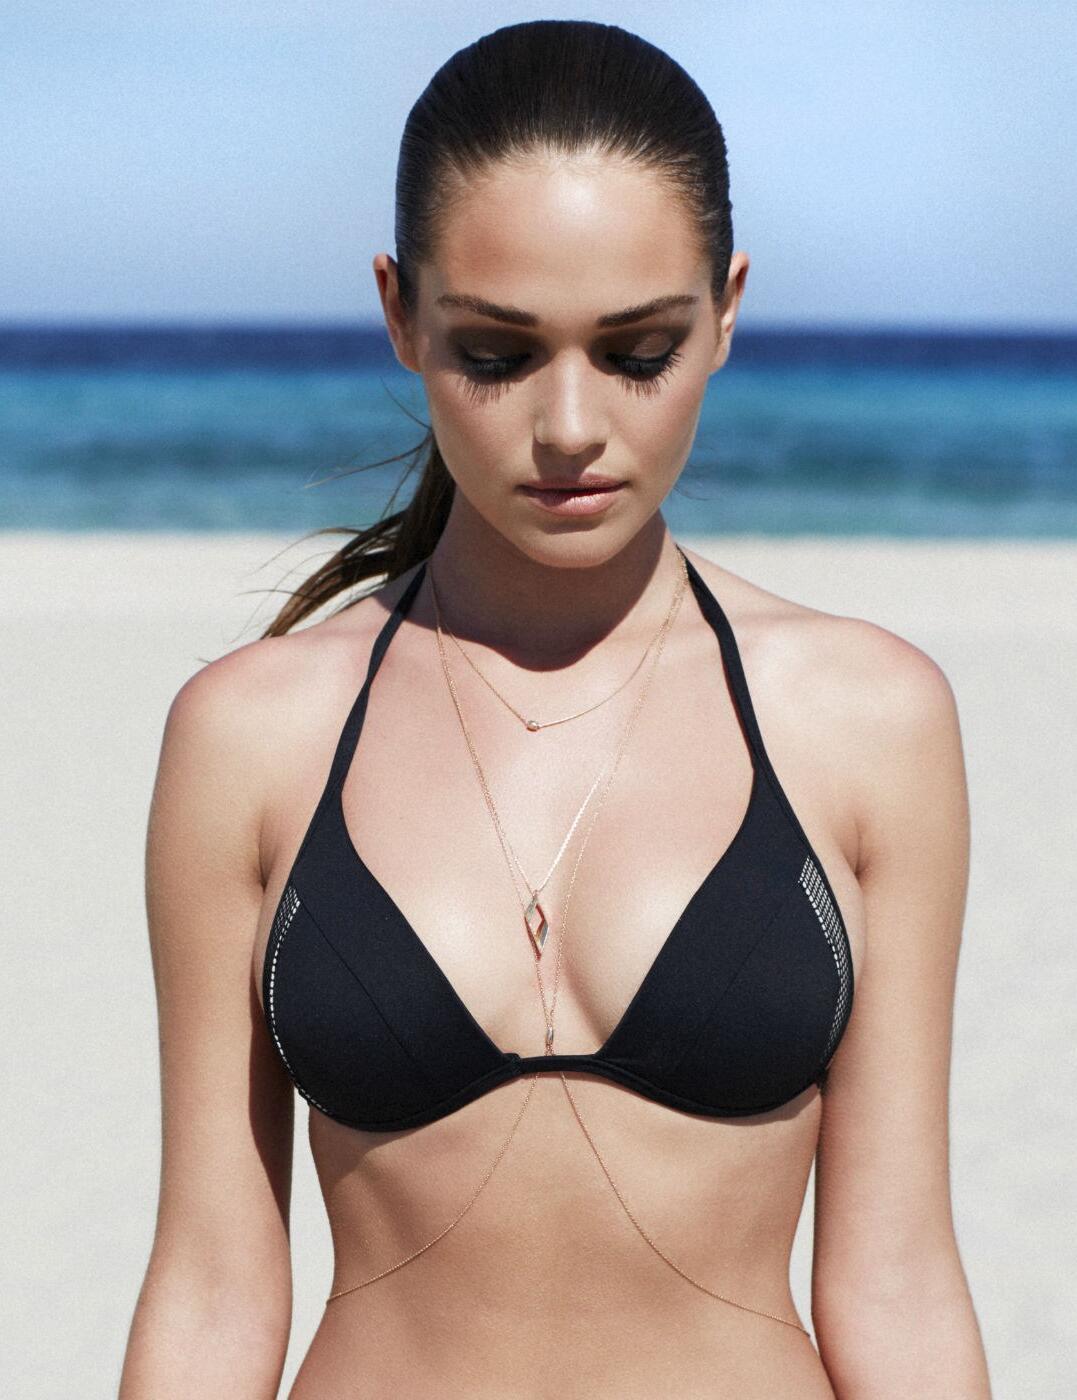 1538630 Lepel Helena Triangle Bikini Top Black  - 1538630 Triangle Top